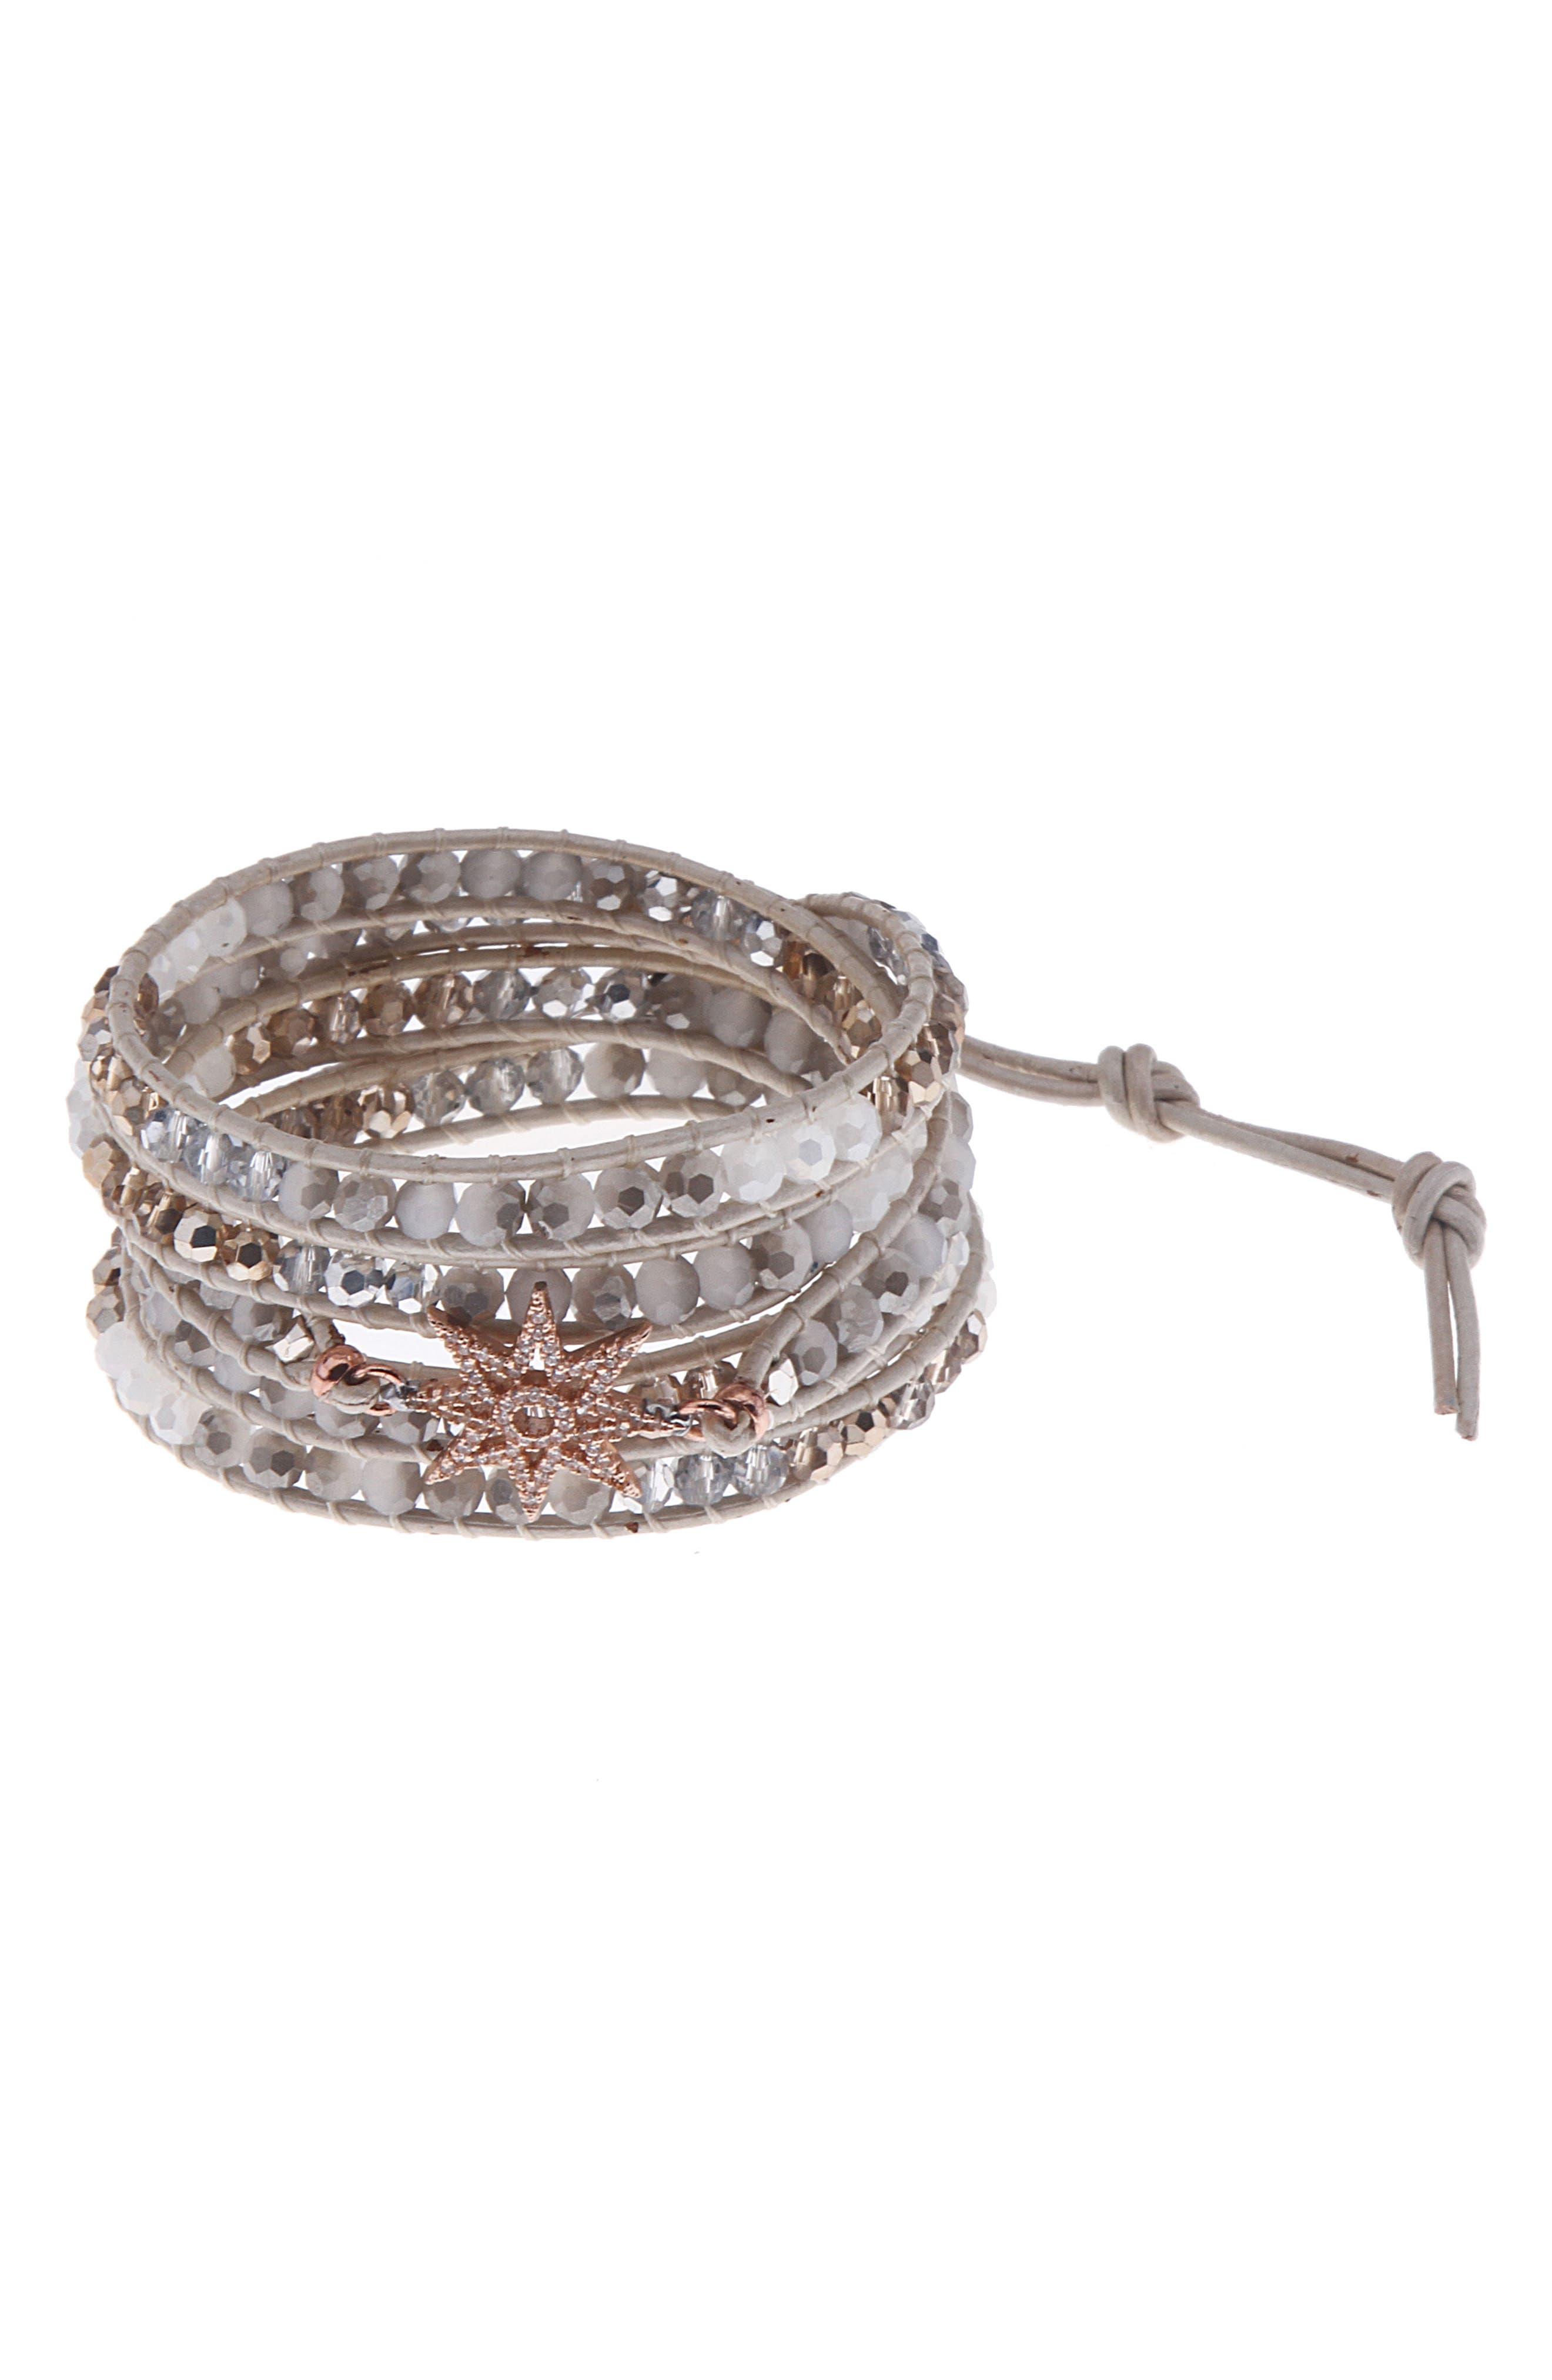 Crystal Charm Wrap Bracelet,                             Main thumbnail 1, color,                             023